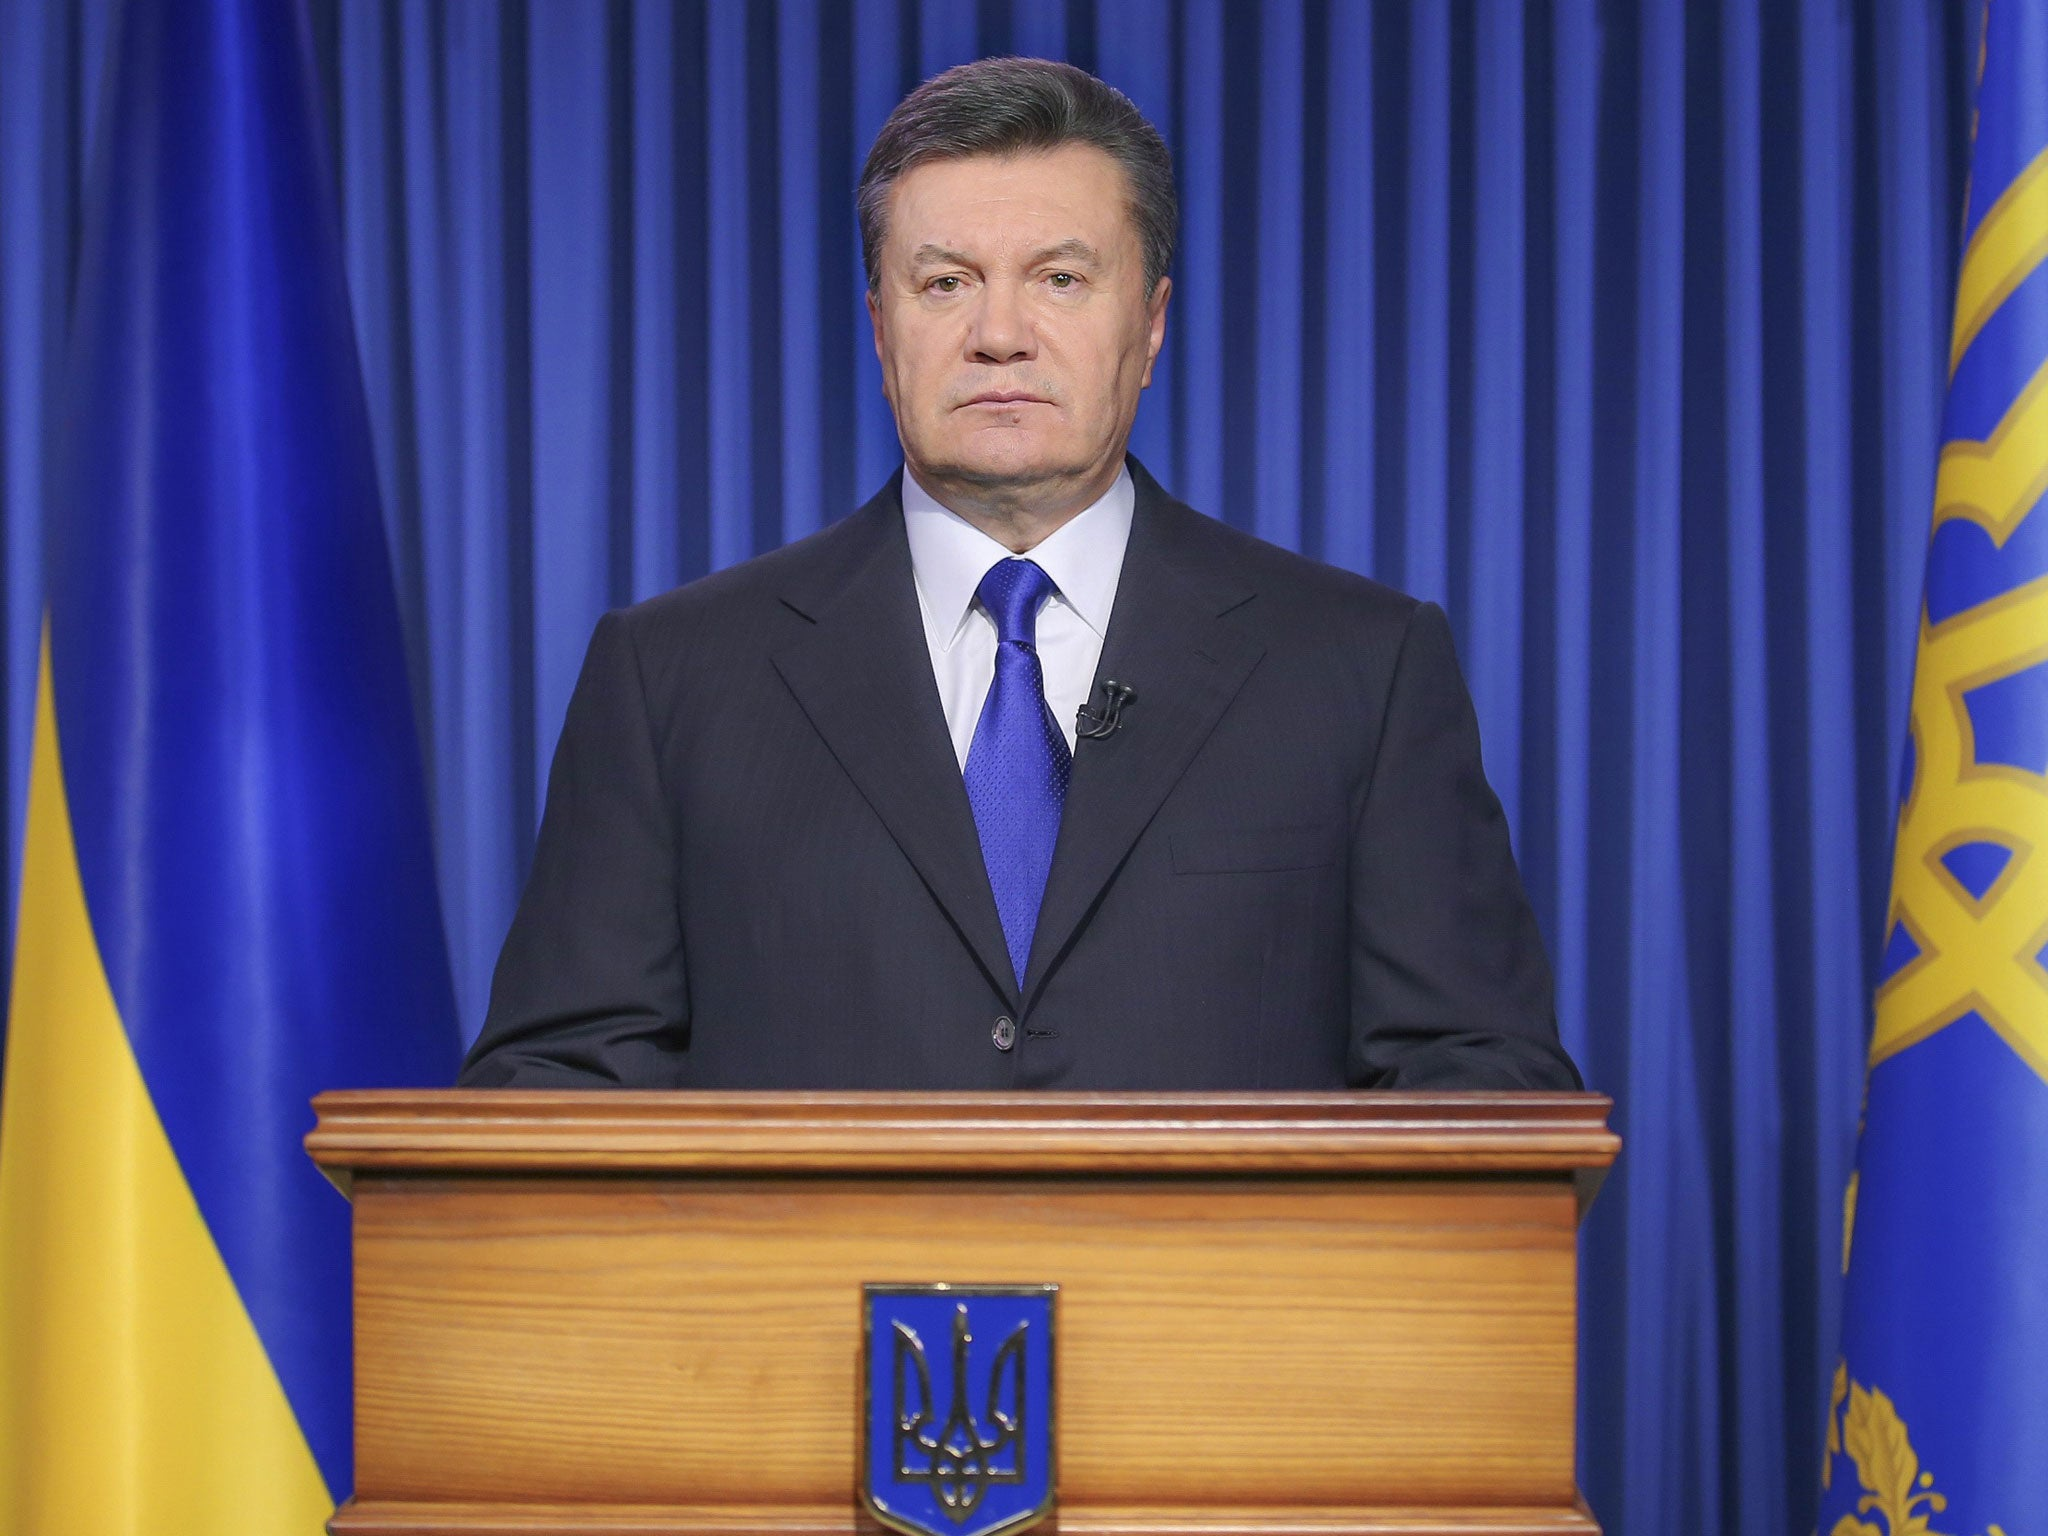 Ukraine president yanukovych wife sexual dysfunction